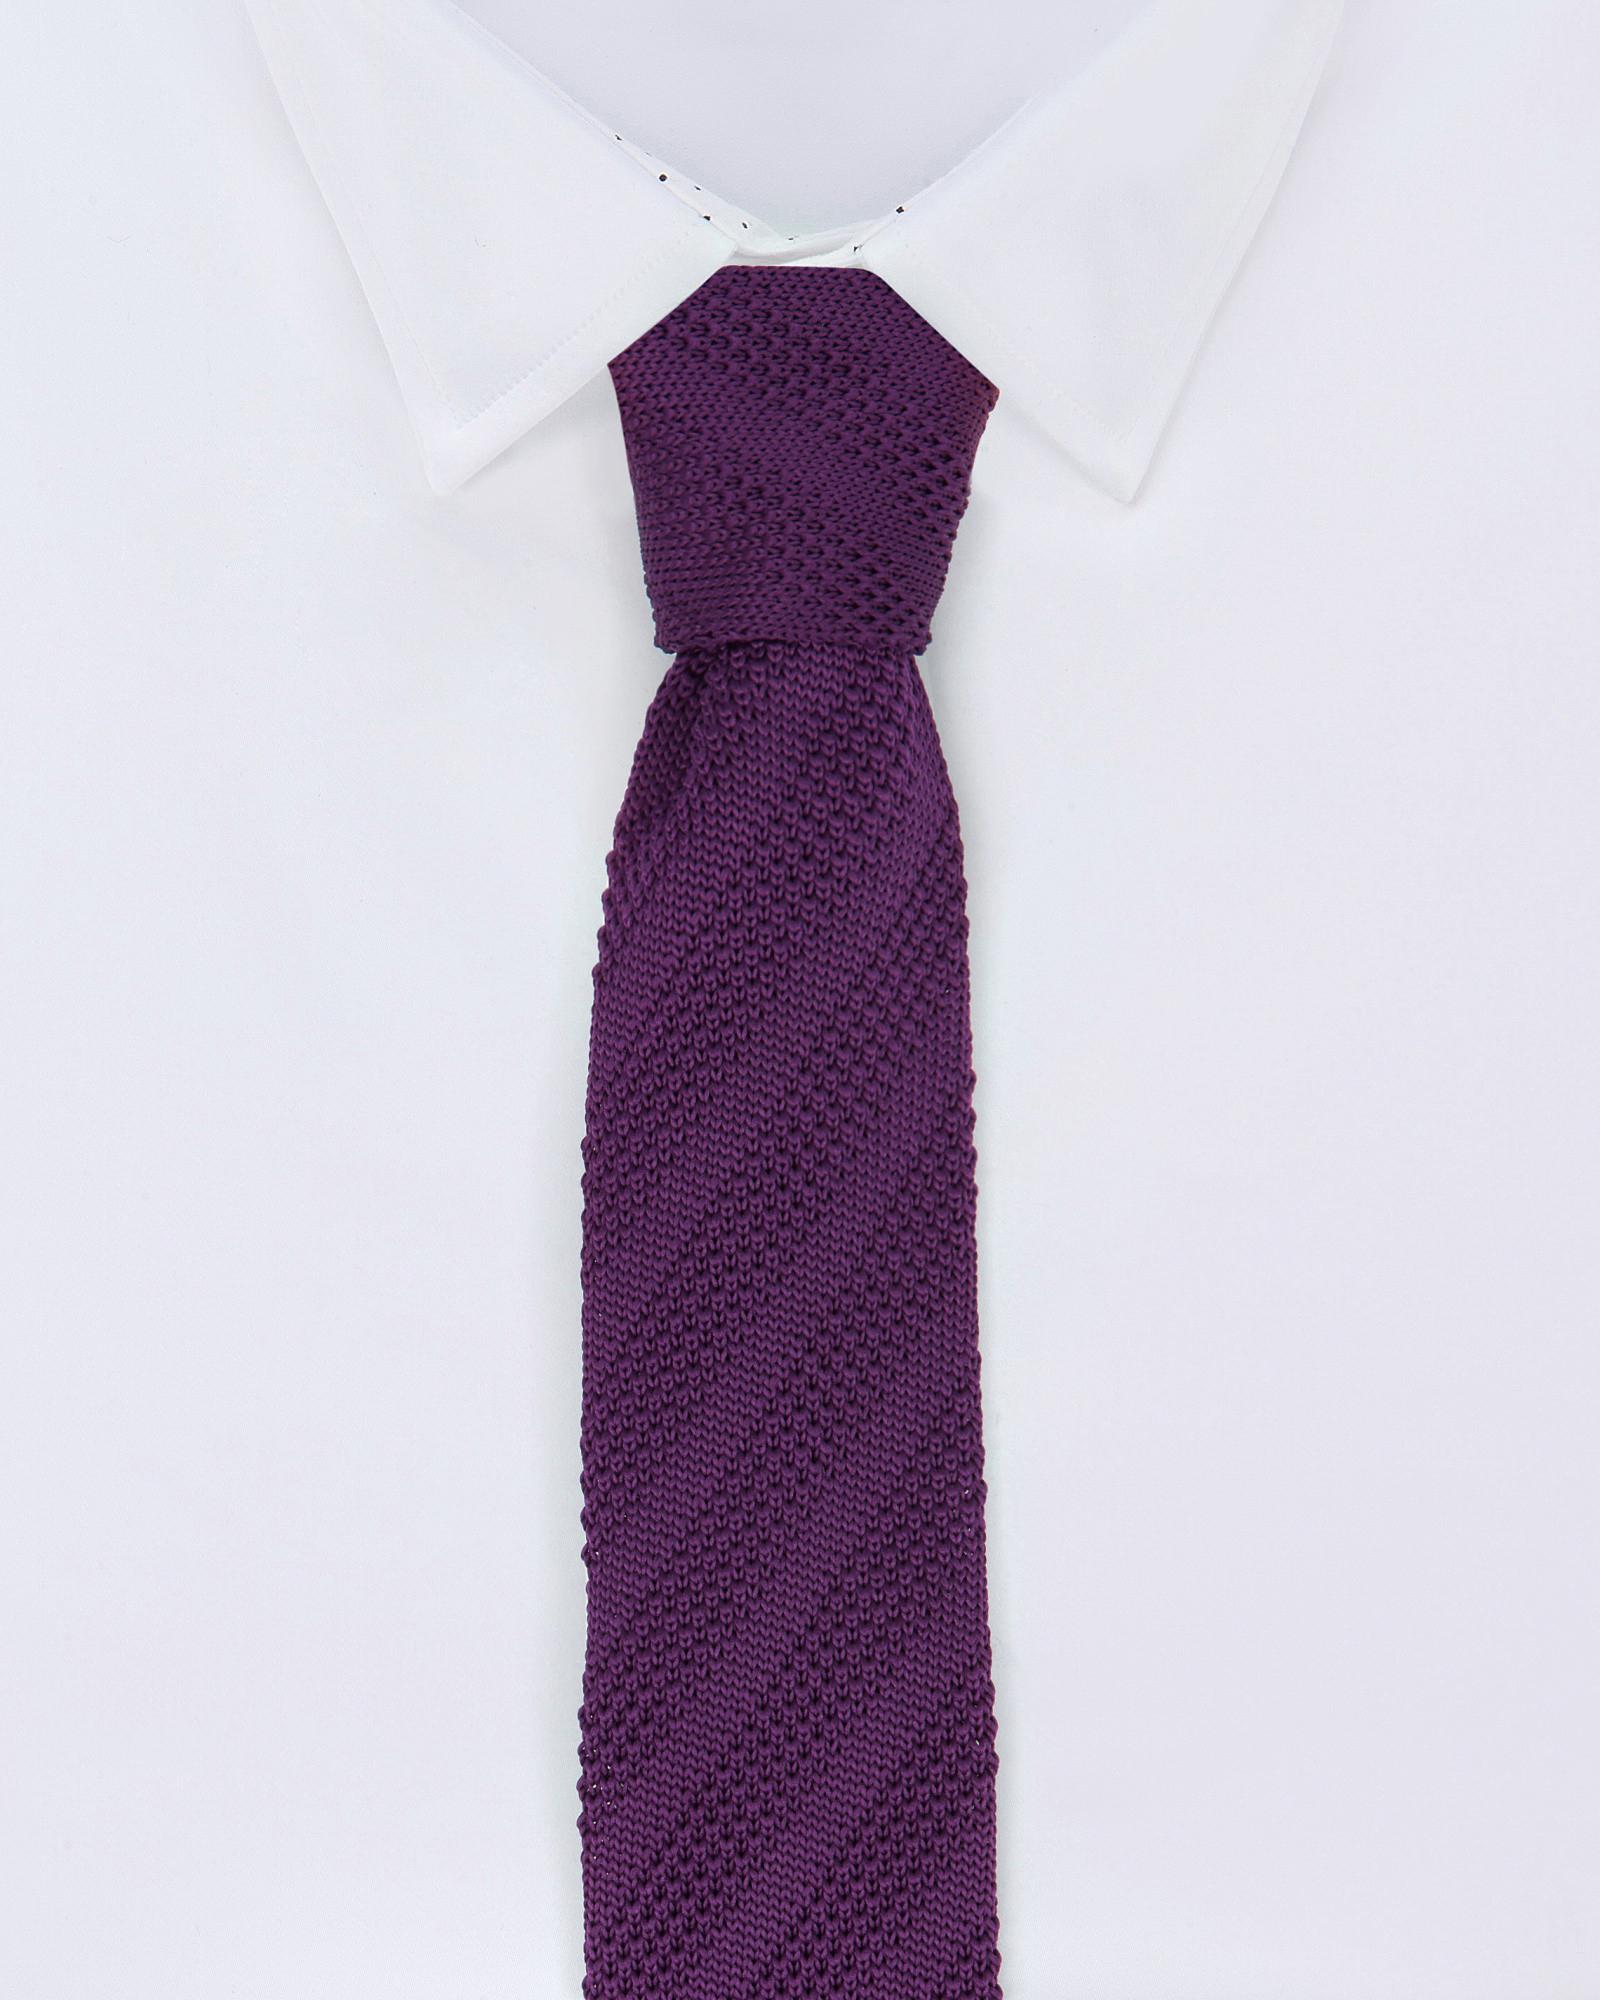 Knitted Tie Ted Baker WyKDw